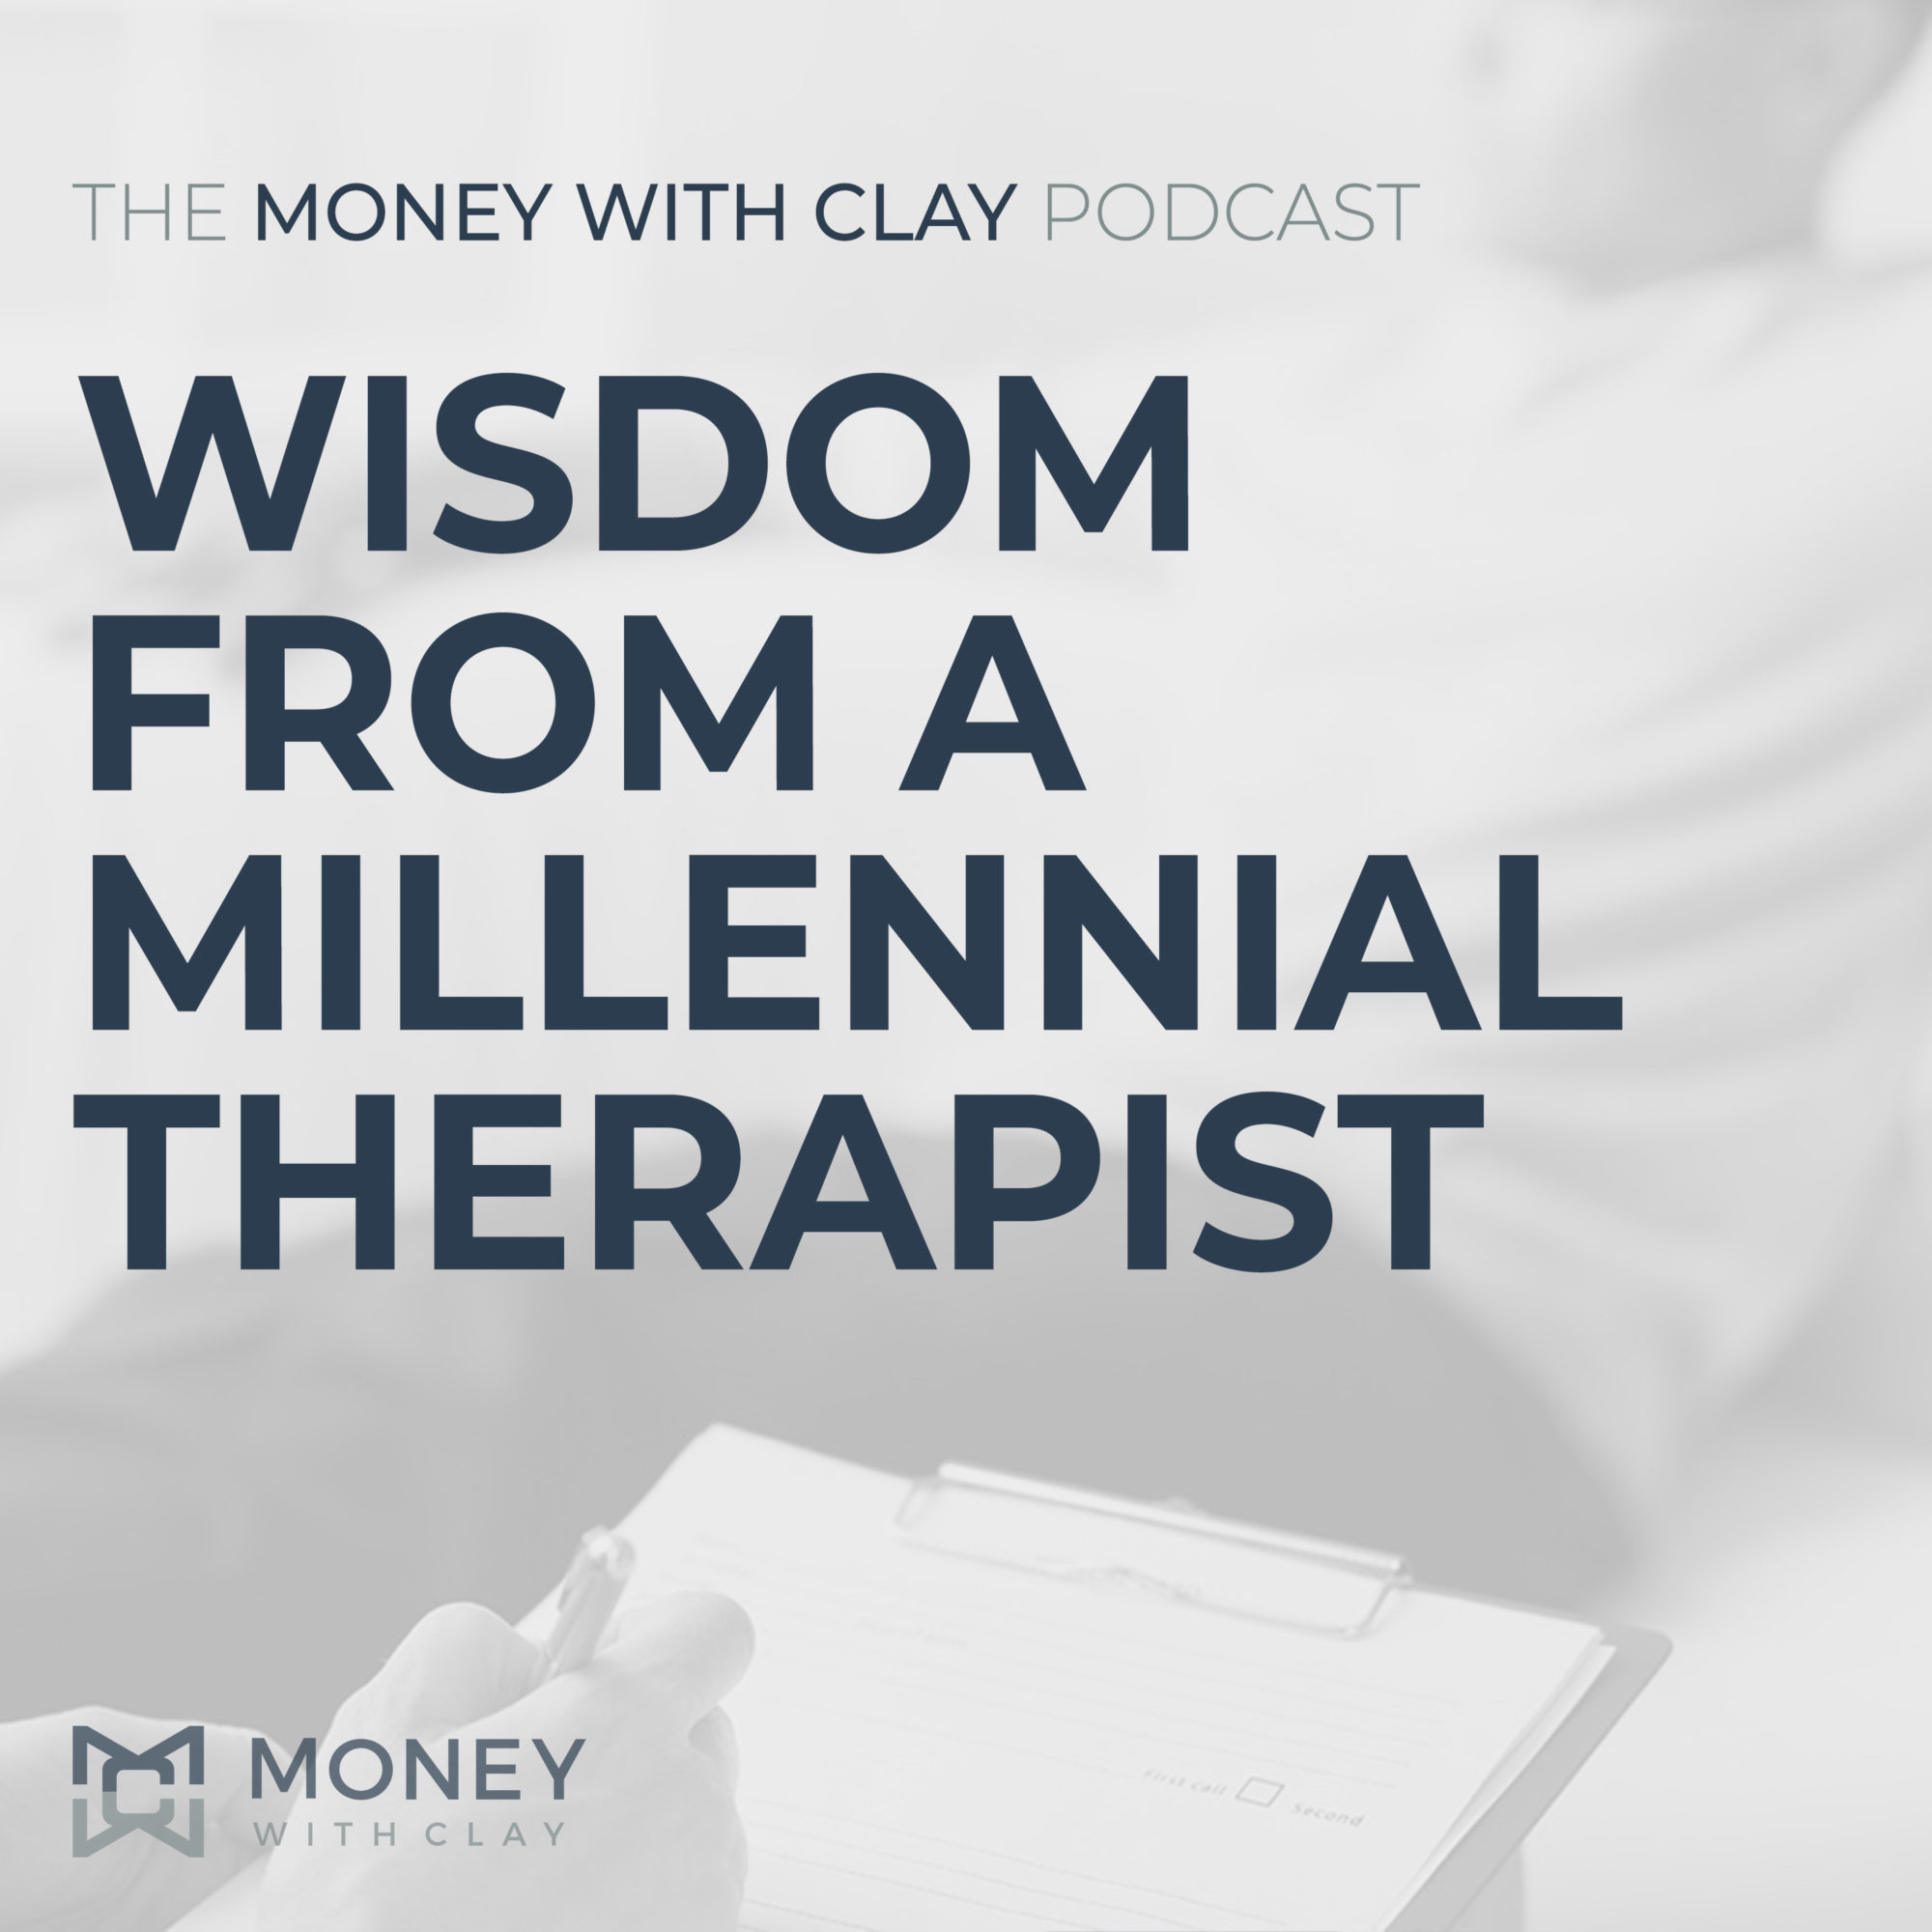 #060 - Wisdom From A Millennial Therapist